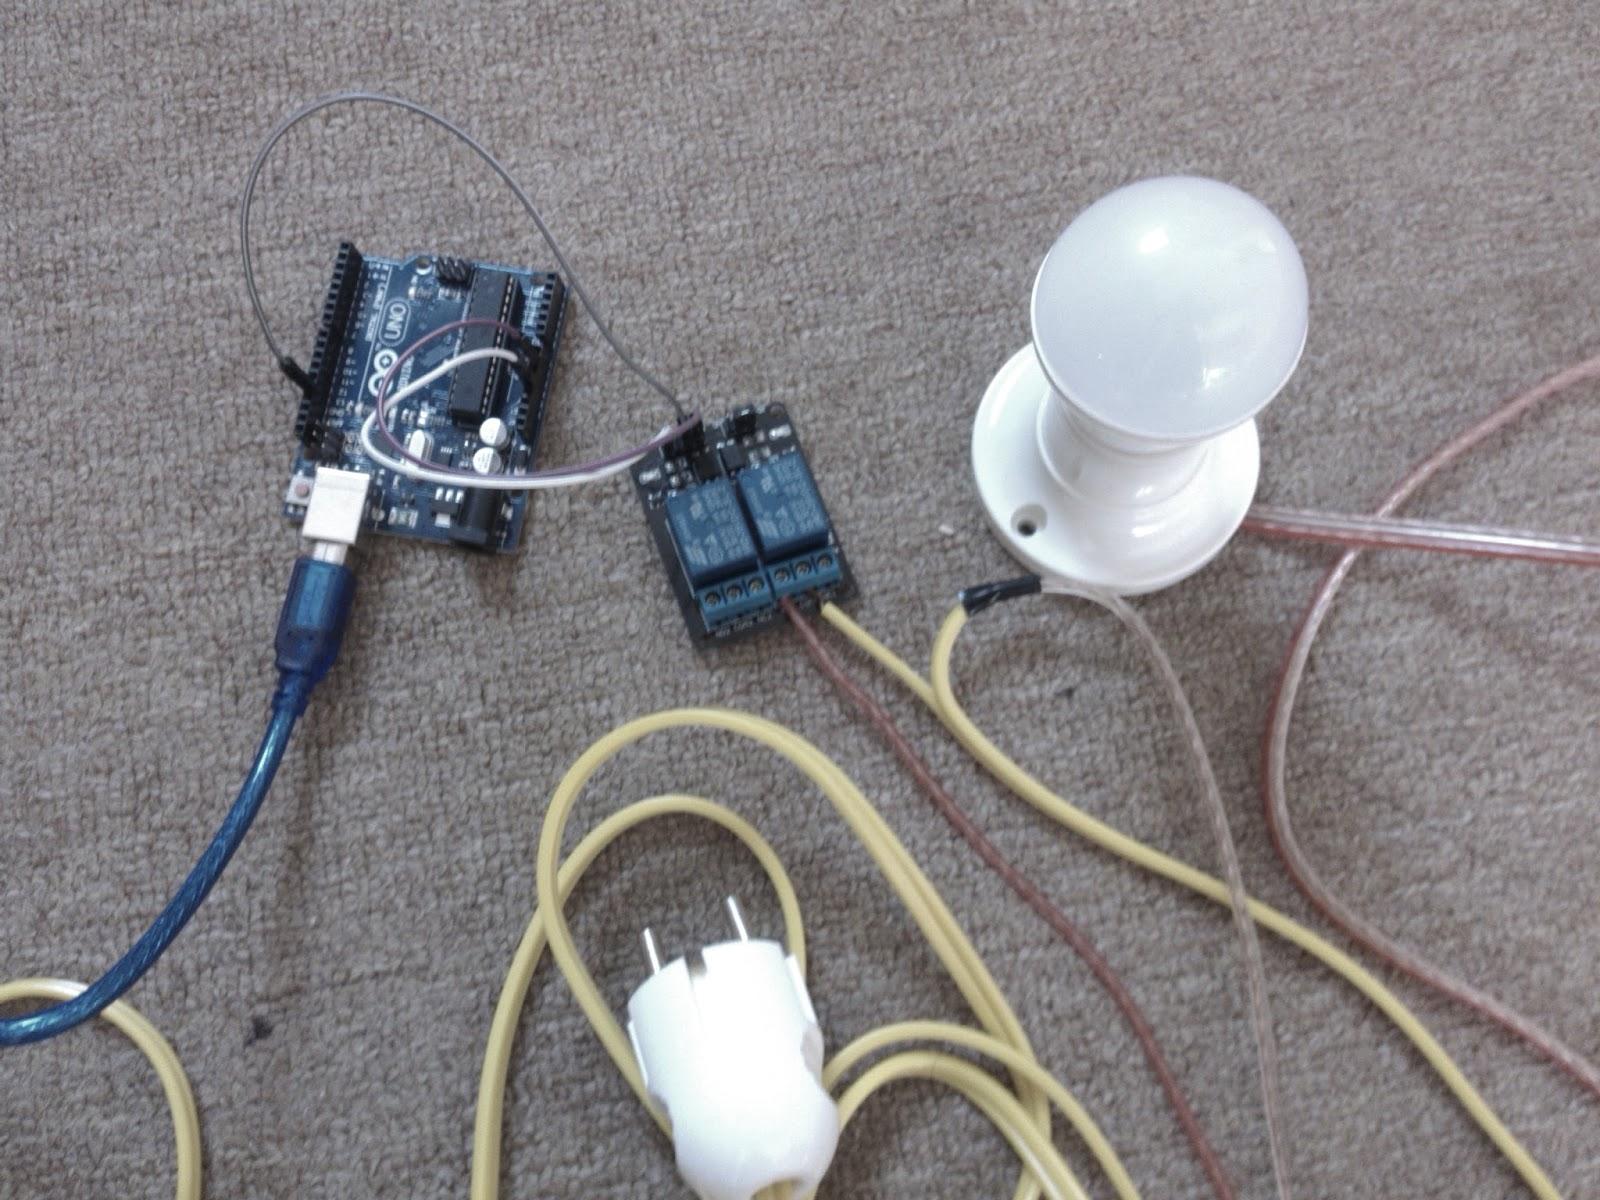 Proyek Arduino 2 Menyalakan Lampu Rumah Ac Menggunakan 4 Terminal Pada Relay Program Yang Saya Buat Adalah Mampu Memberikan Sinyal Untuk Dan Mematikan Melalui Pin Output 13 Sehingga Akan